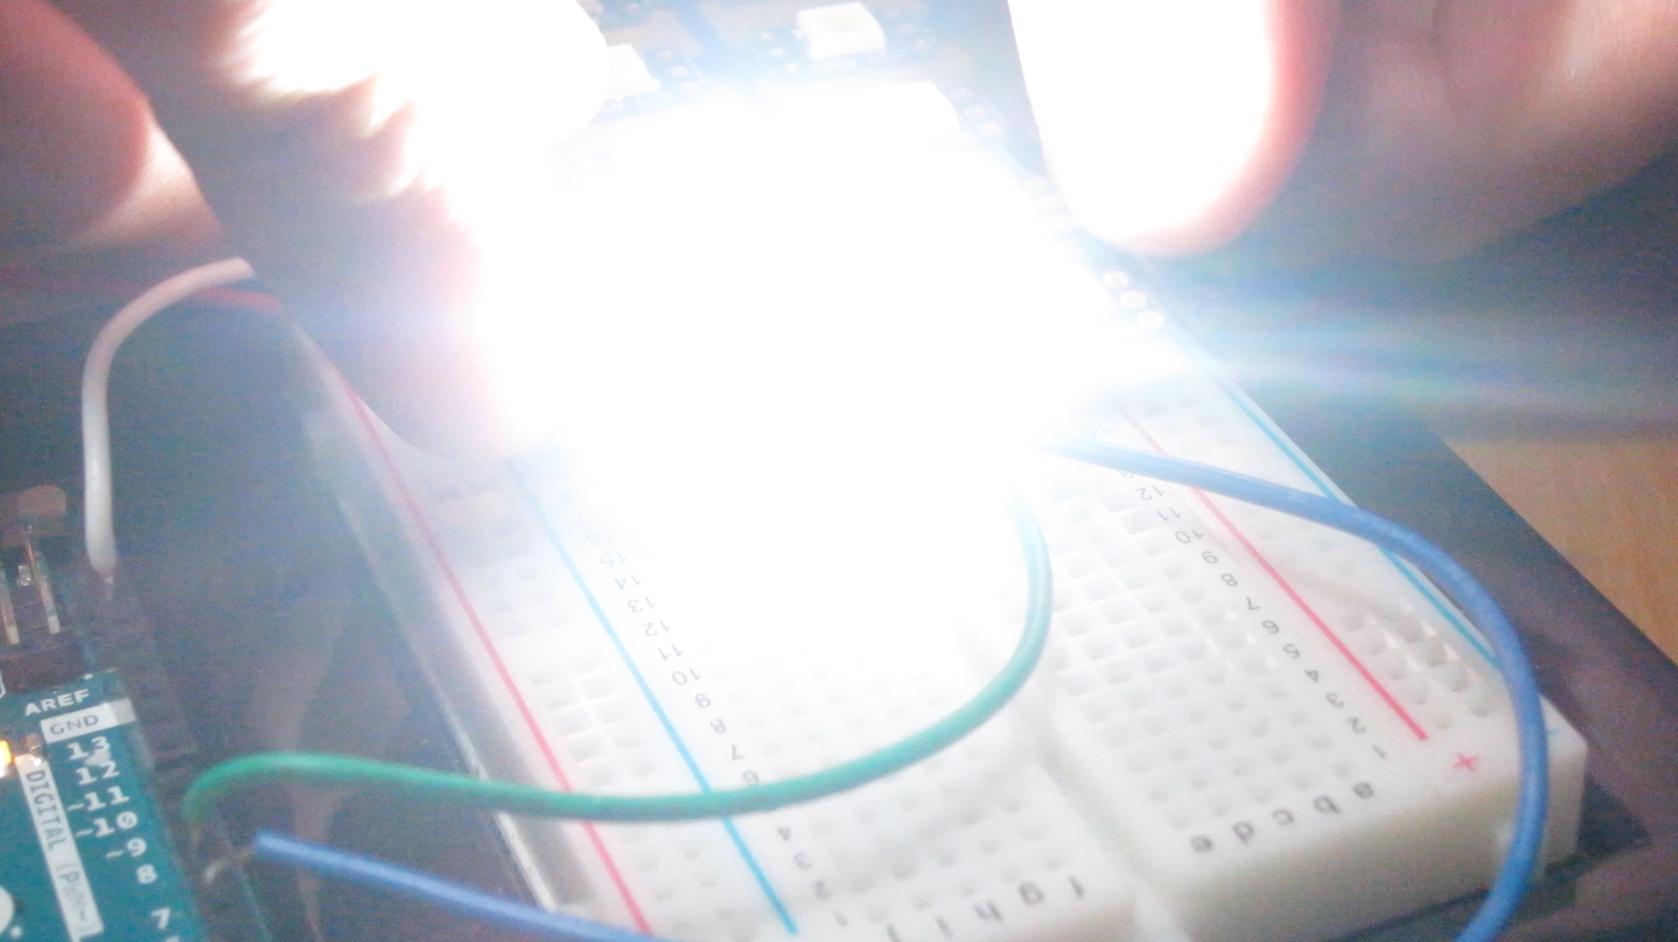 adafruit_products_Color_Balancing_Light_51.jpg